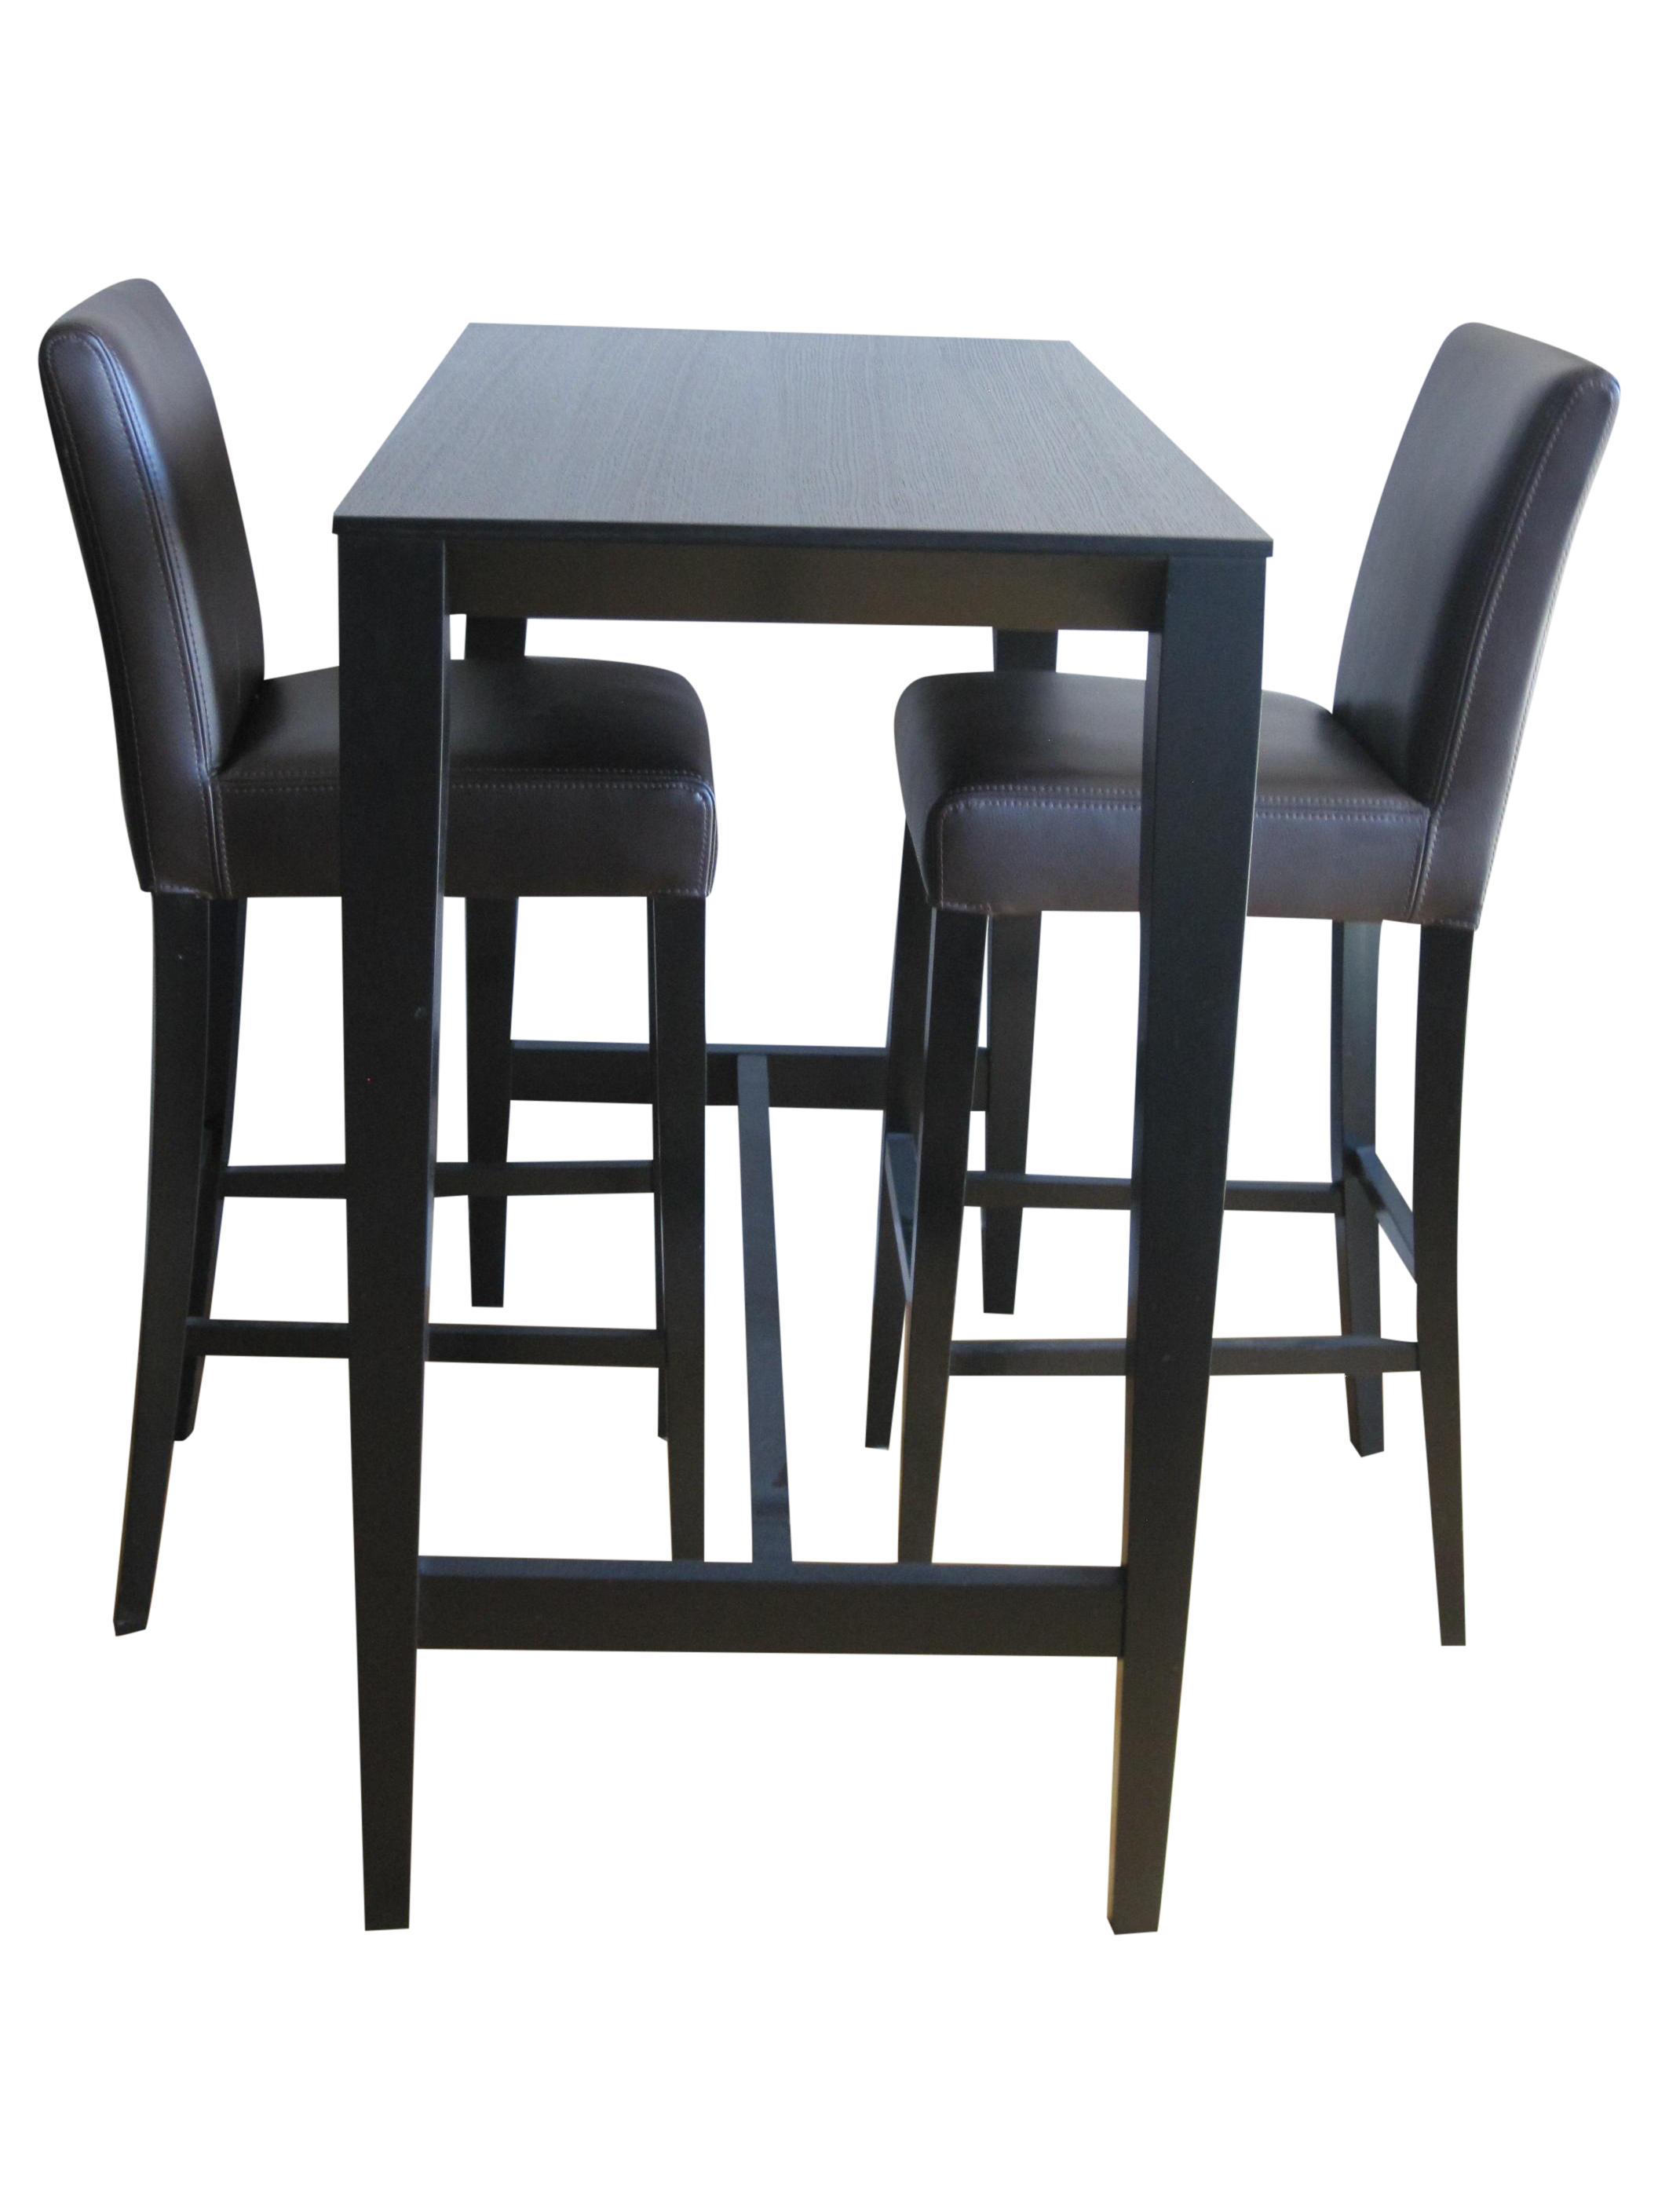 Crate & Barrel Lowe Bar Chairs & Triad Table | Chairish